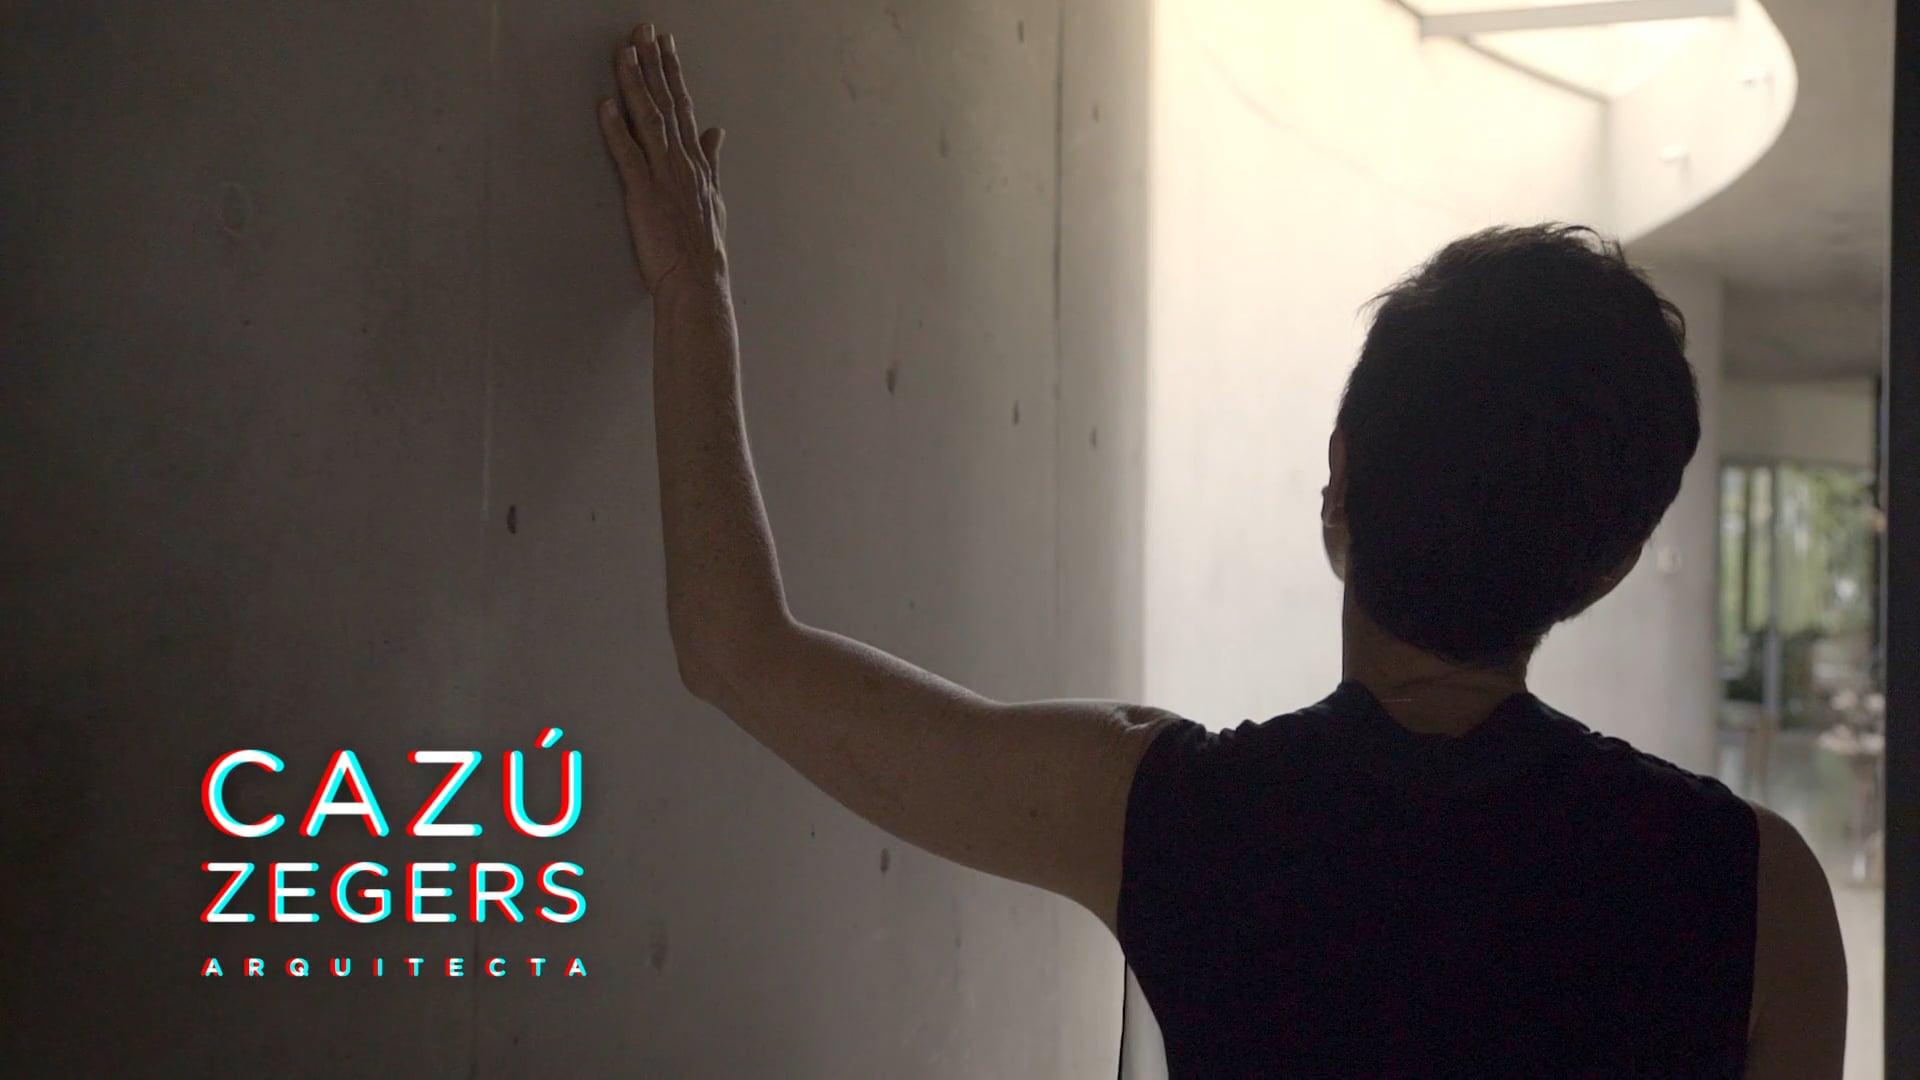 HALO8 / CAZU ZEGERS / ARQUITECTA